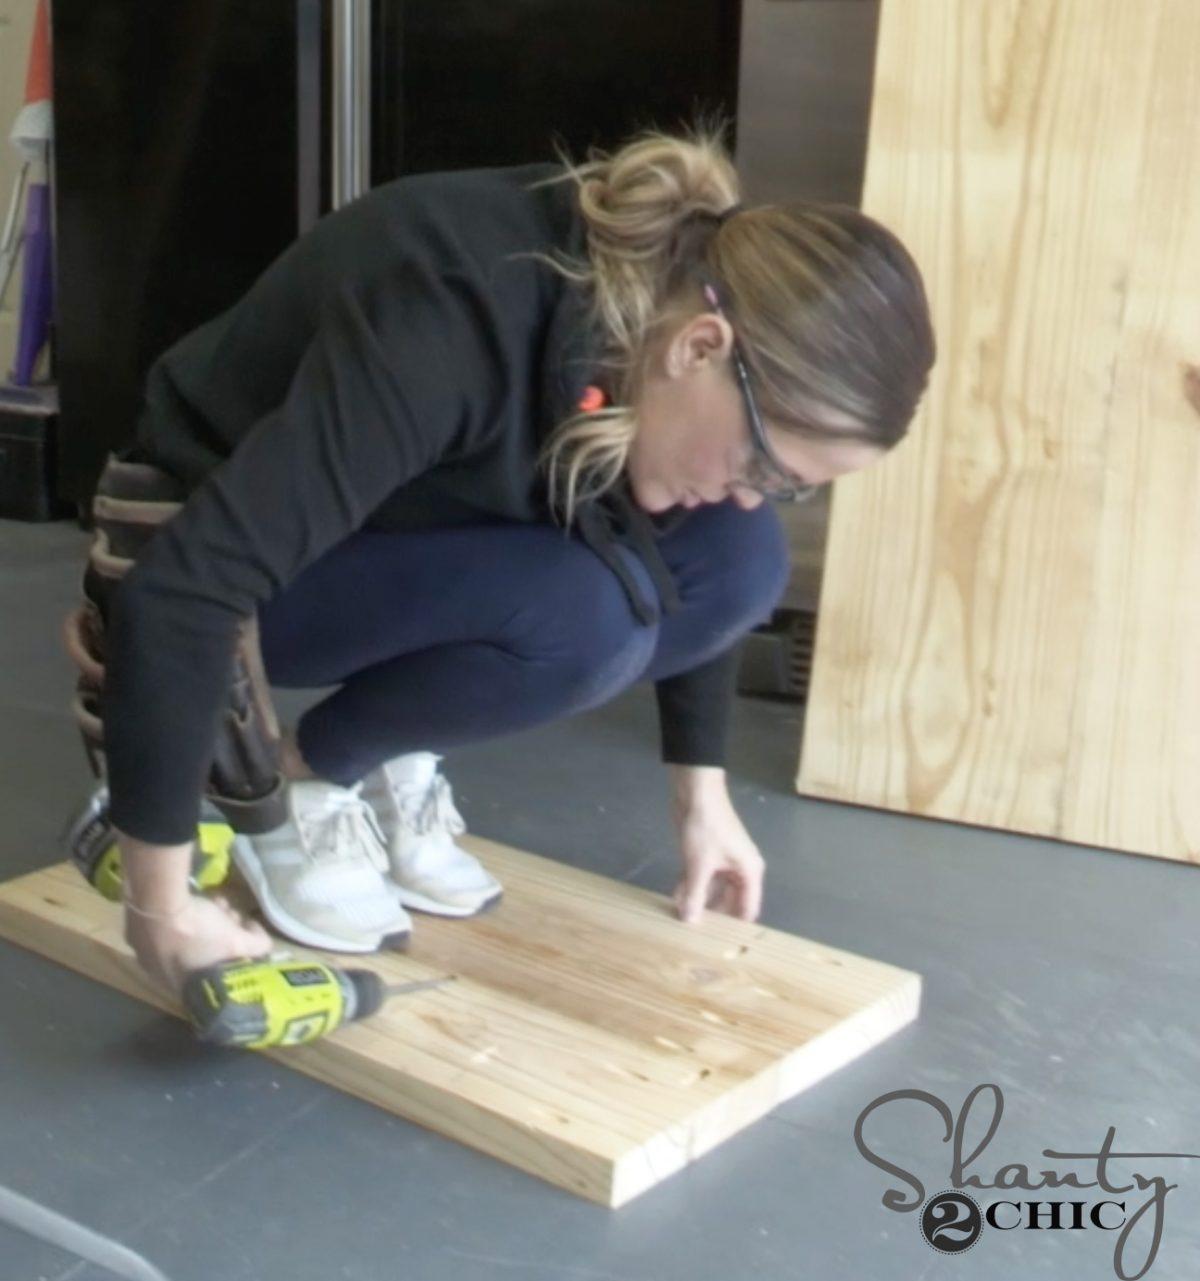 diy pew bench farmhouse table - shanty clamp